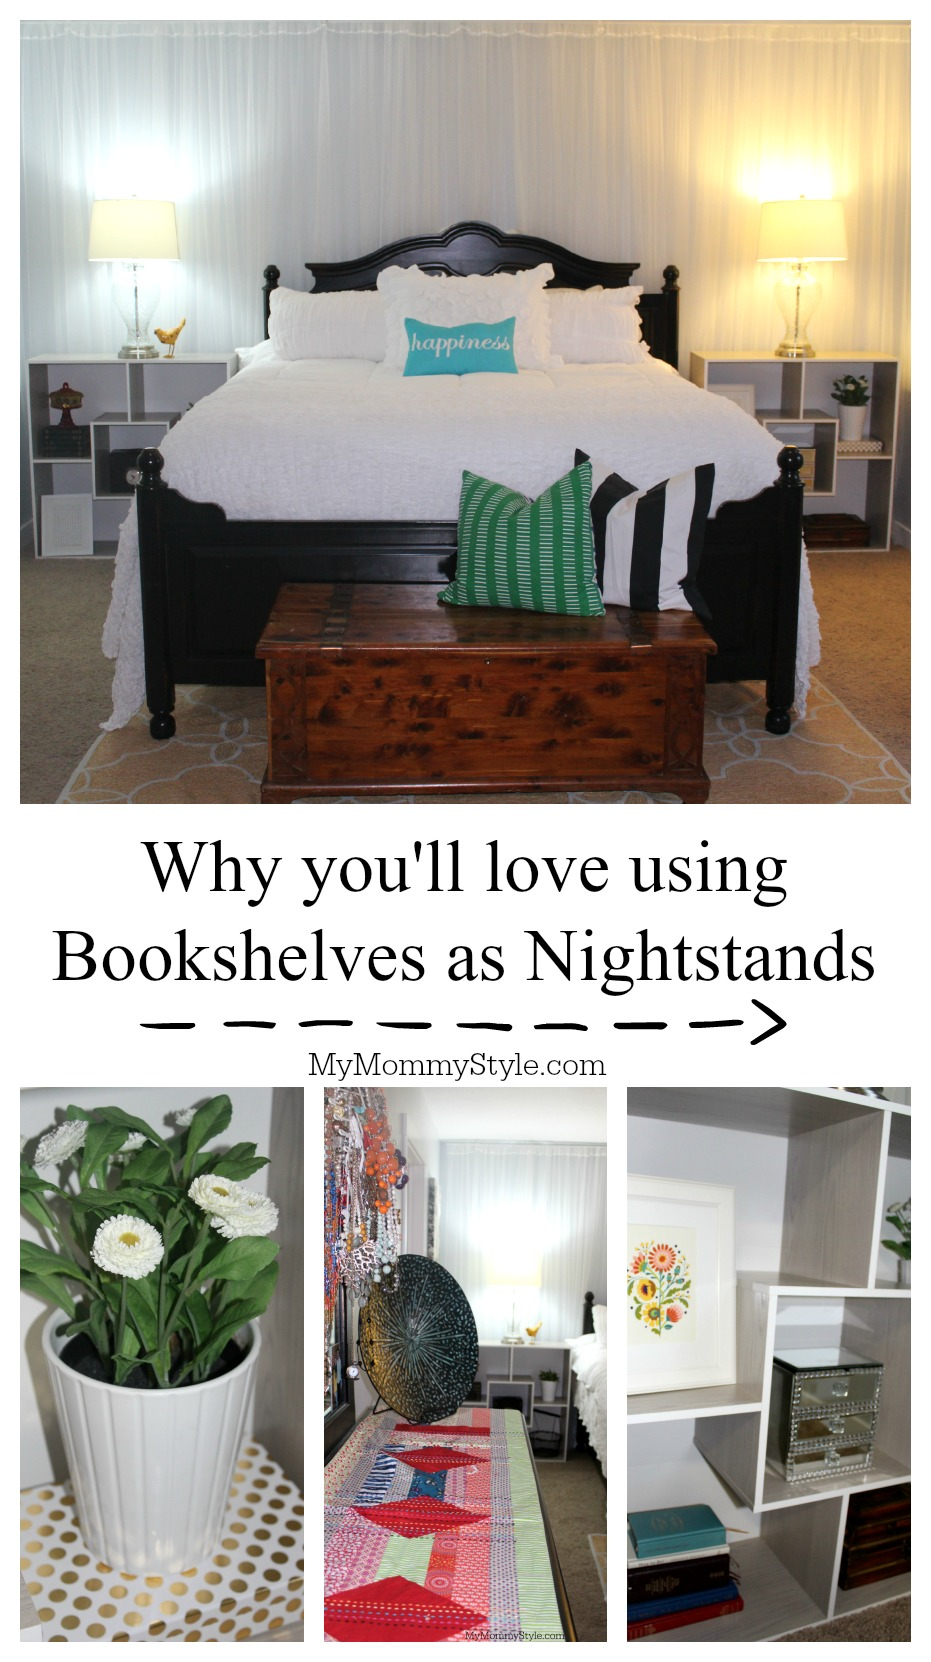 bookshelves as nightstands, sauder, mymommystyle, master bedroom, bookshelves as nightstands,